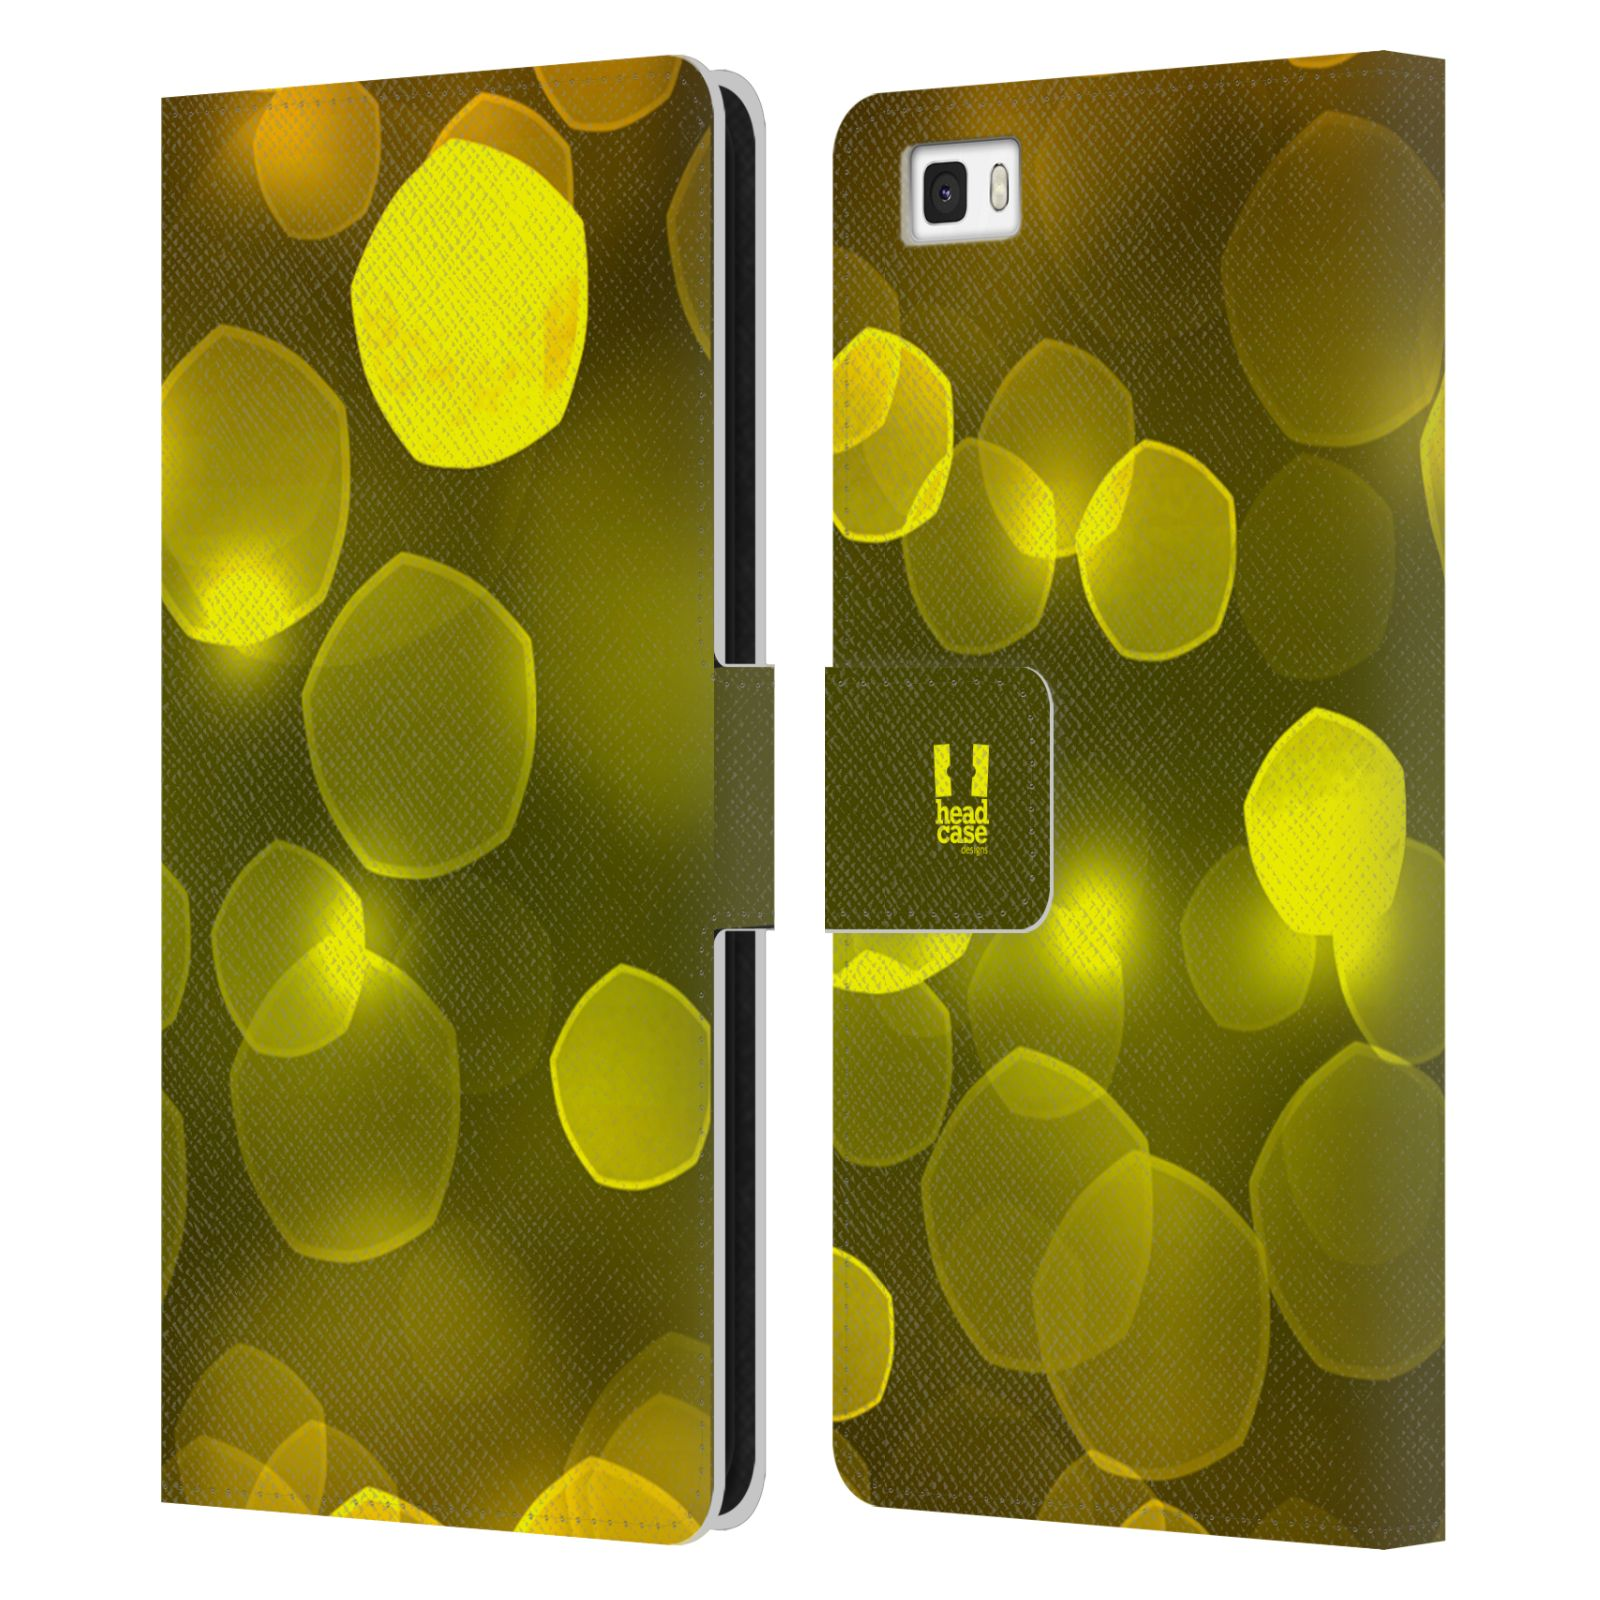 HEAD CASE Flipové pouzdro pro mobil Huawei P8 LITE BOKEH zářící vzor pentagon žlutá